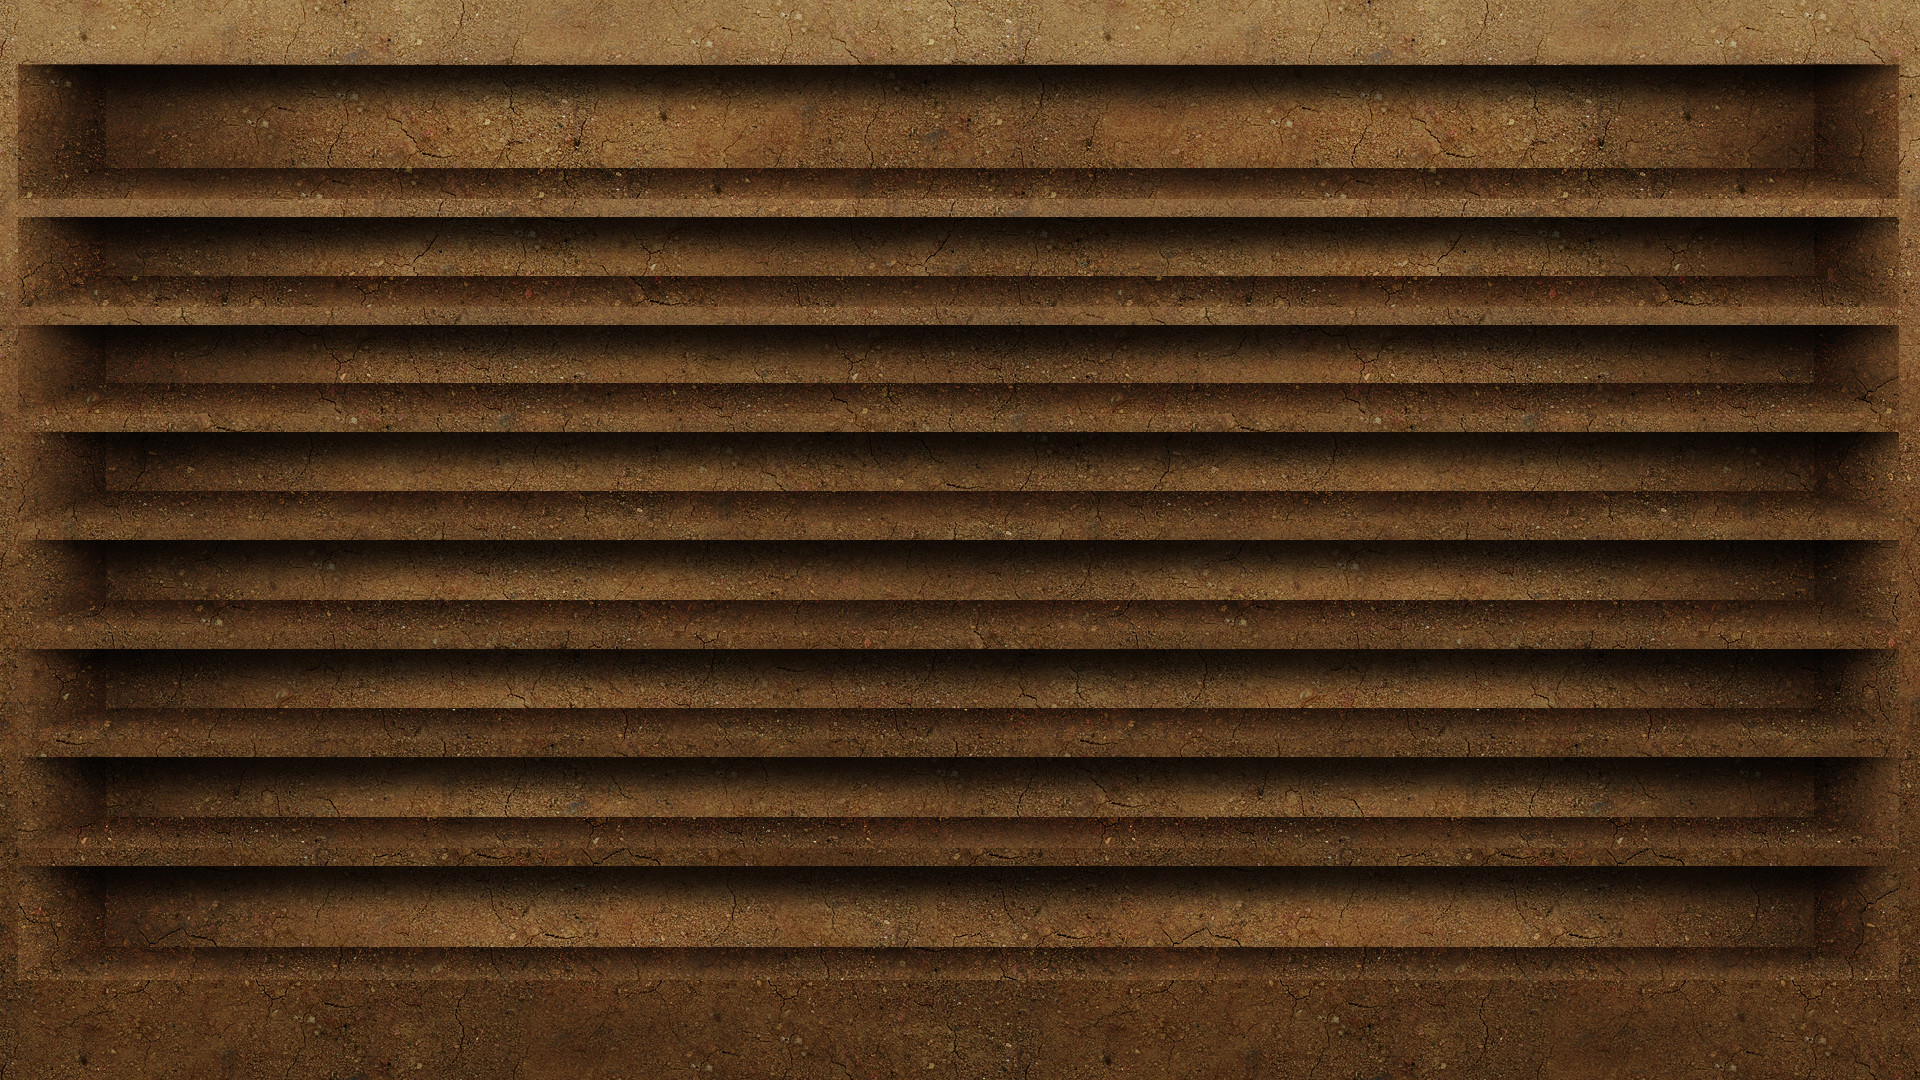 Wallpaper for Shelves – WallpaperSafari